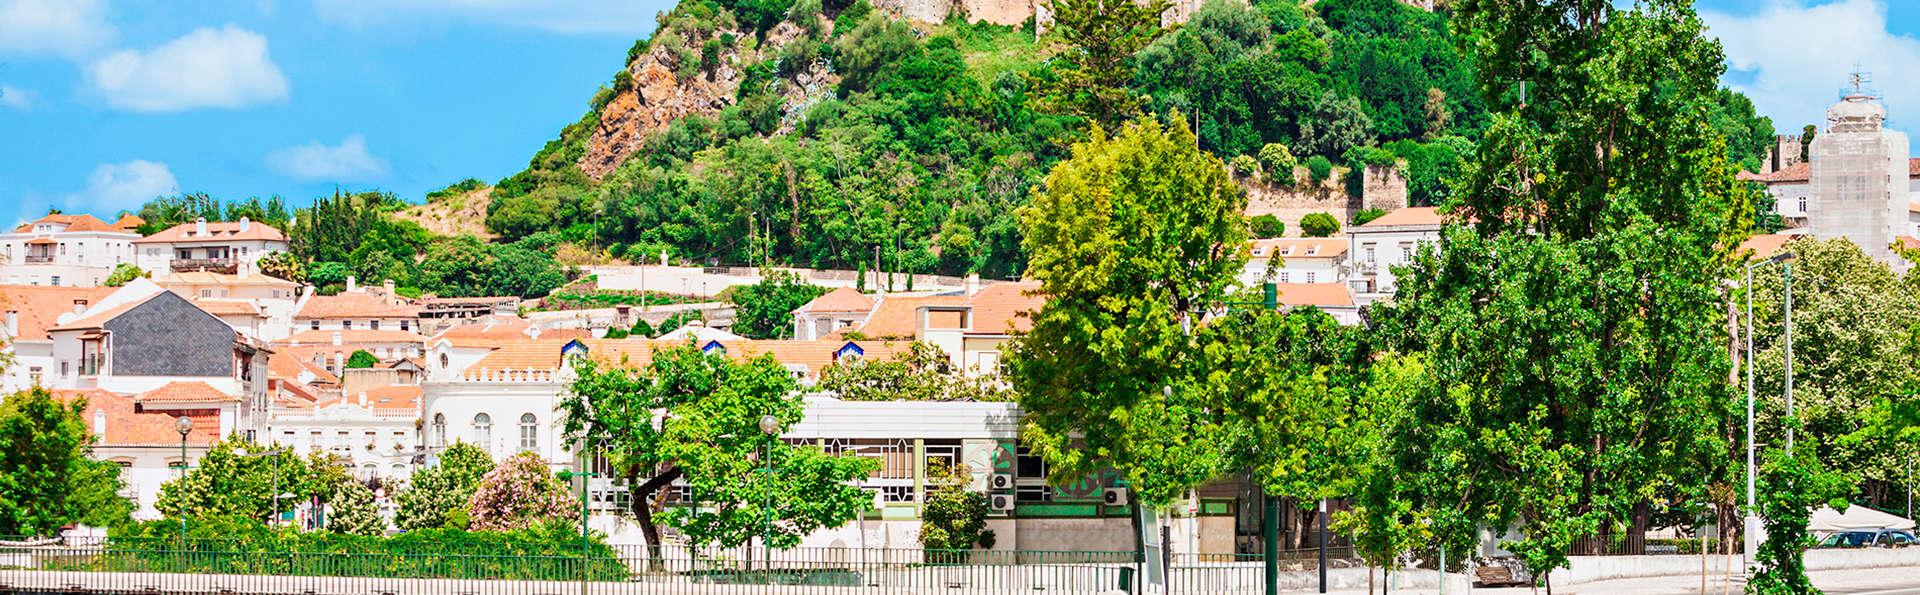 Hotel Evenia Monte Real - EDIT_destination1.jpg